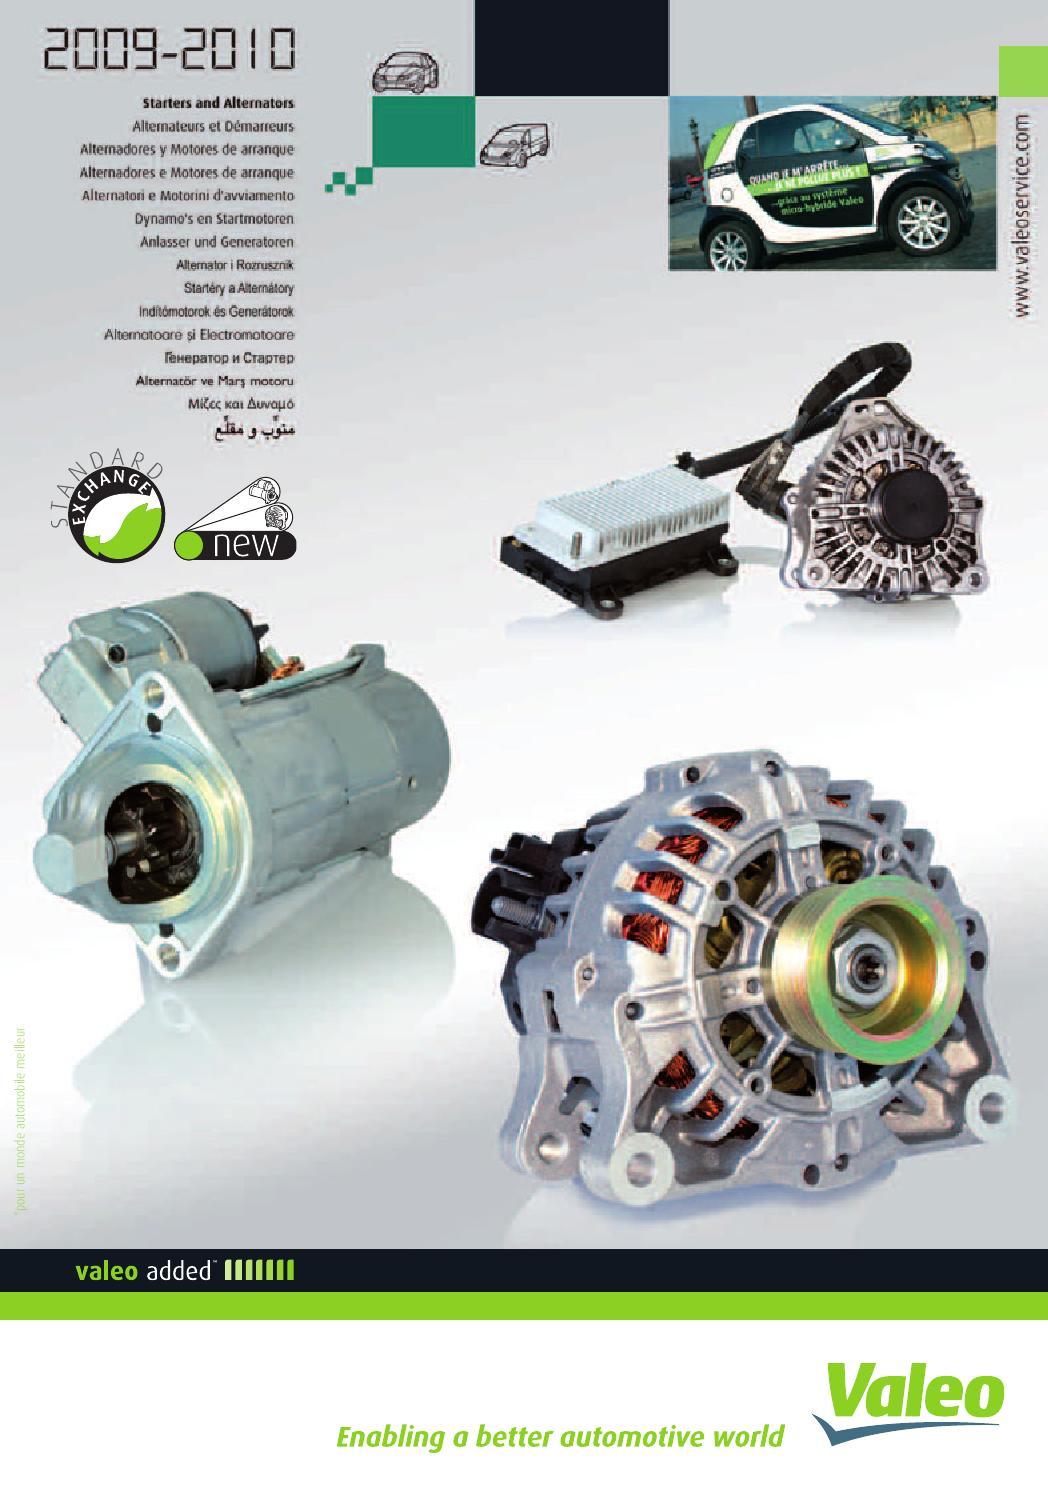 Motor de arranque Starter Chrysler Grand Voyager 5 3.8